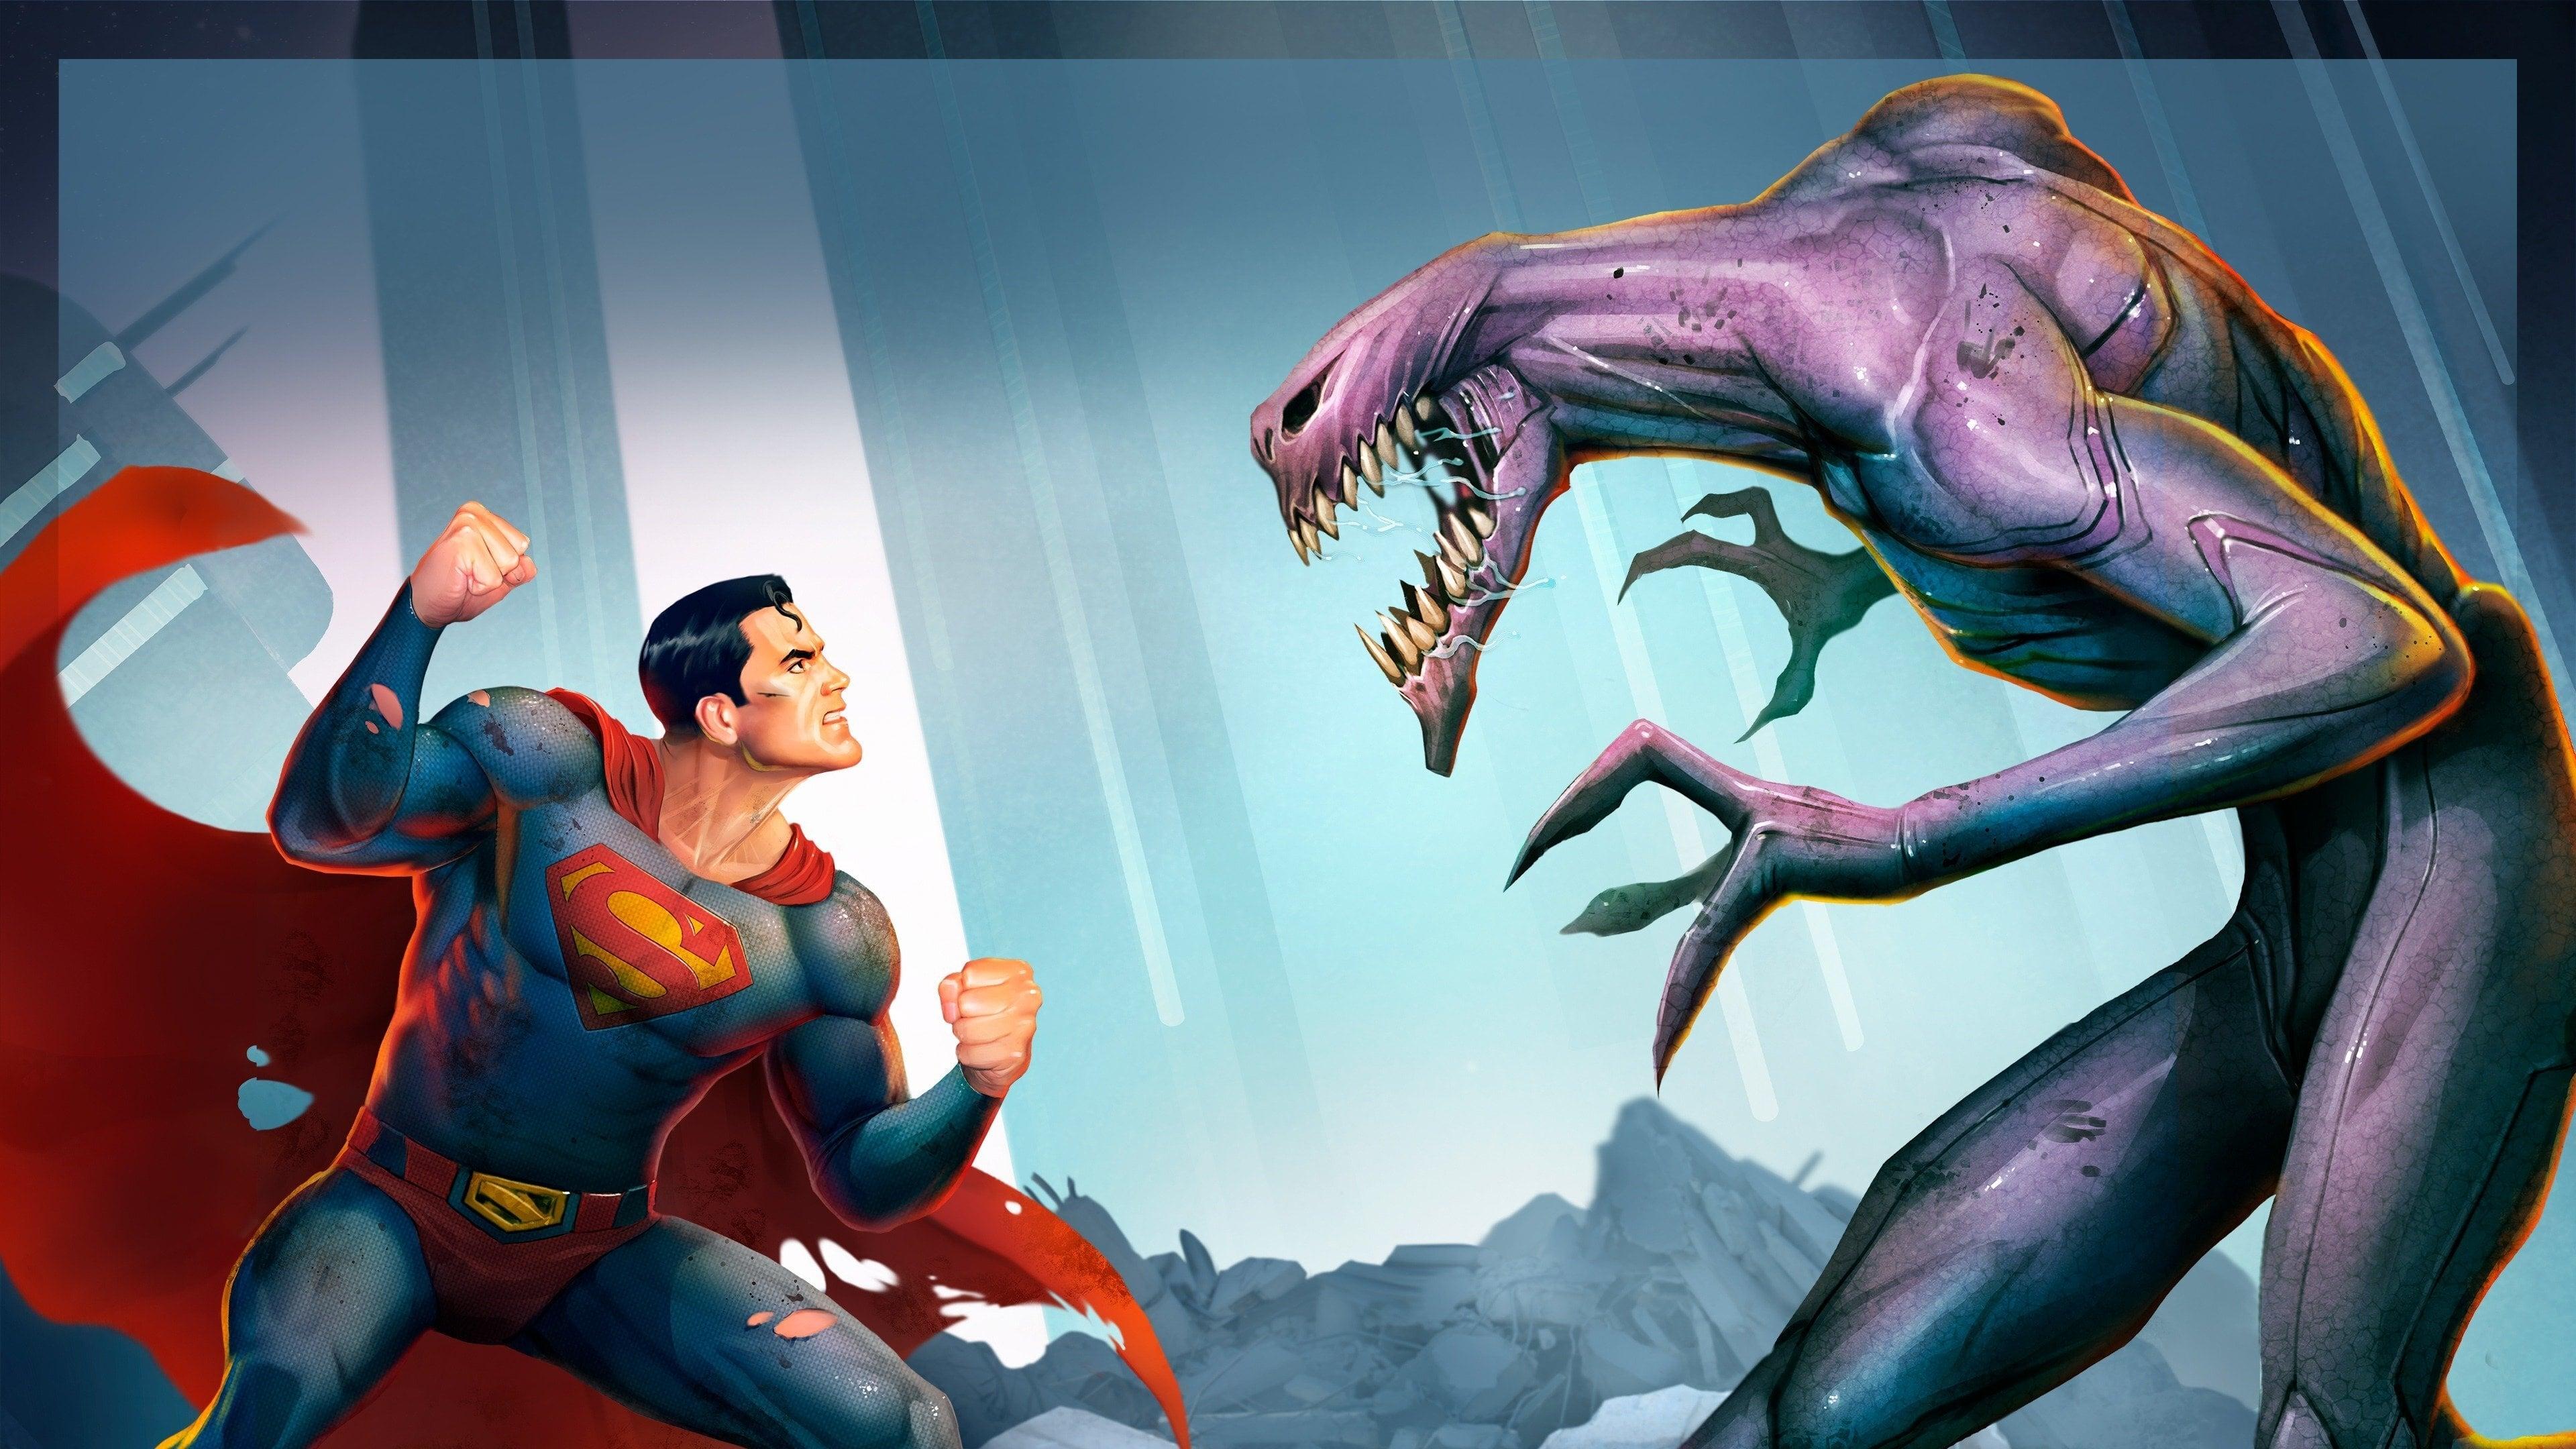 superman man of tomorrow 4k 1602421015 - Superman Man Of Tomorrow 4k - Superman Man Of Tomorrow 4k wallpapers